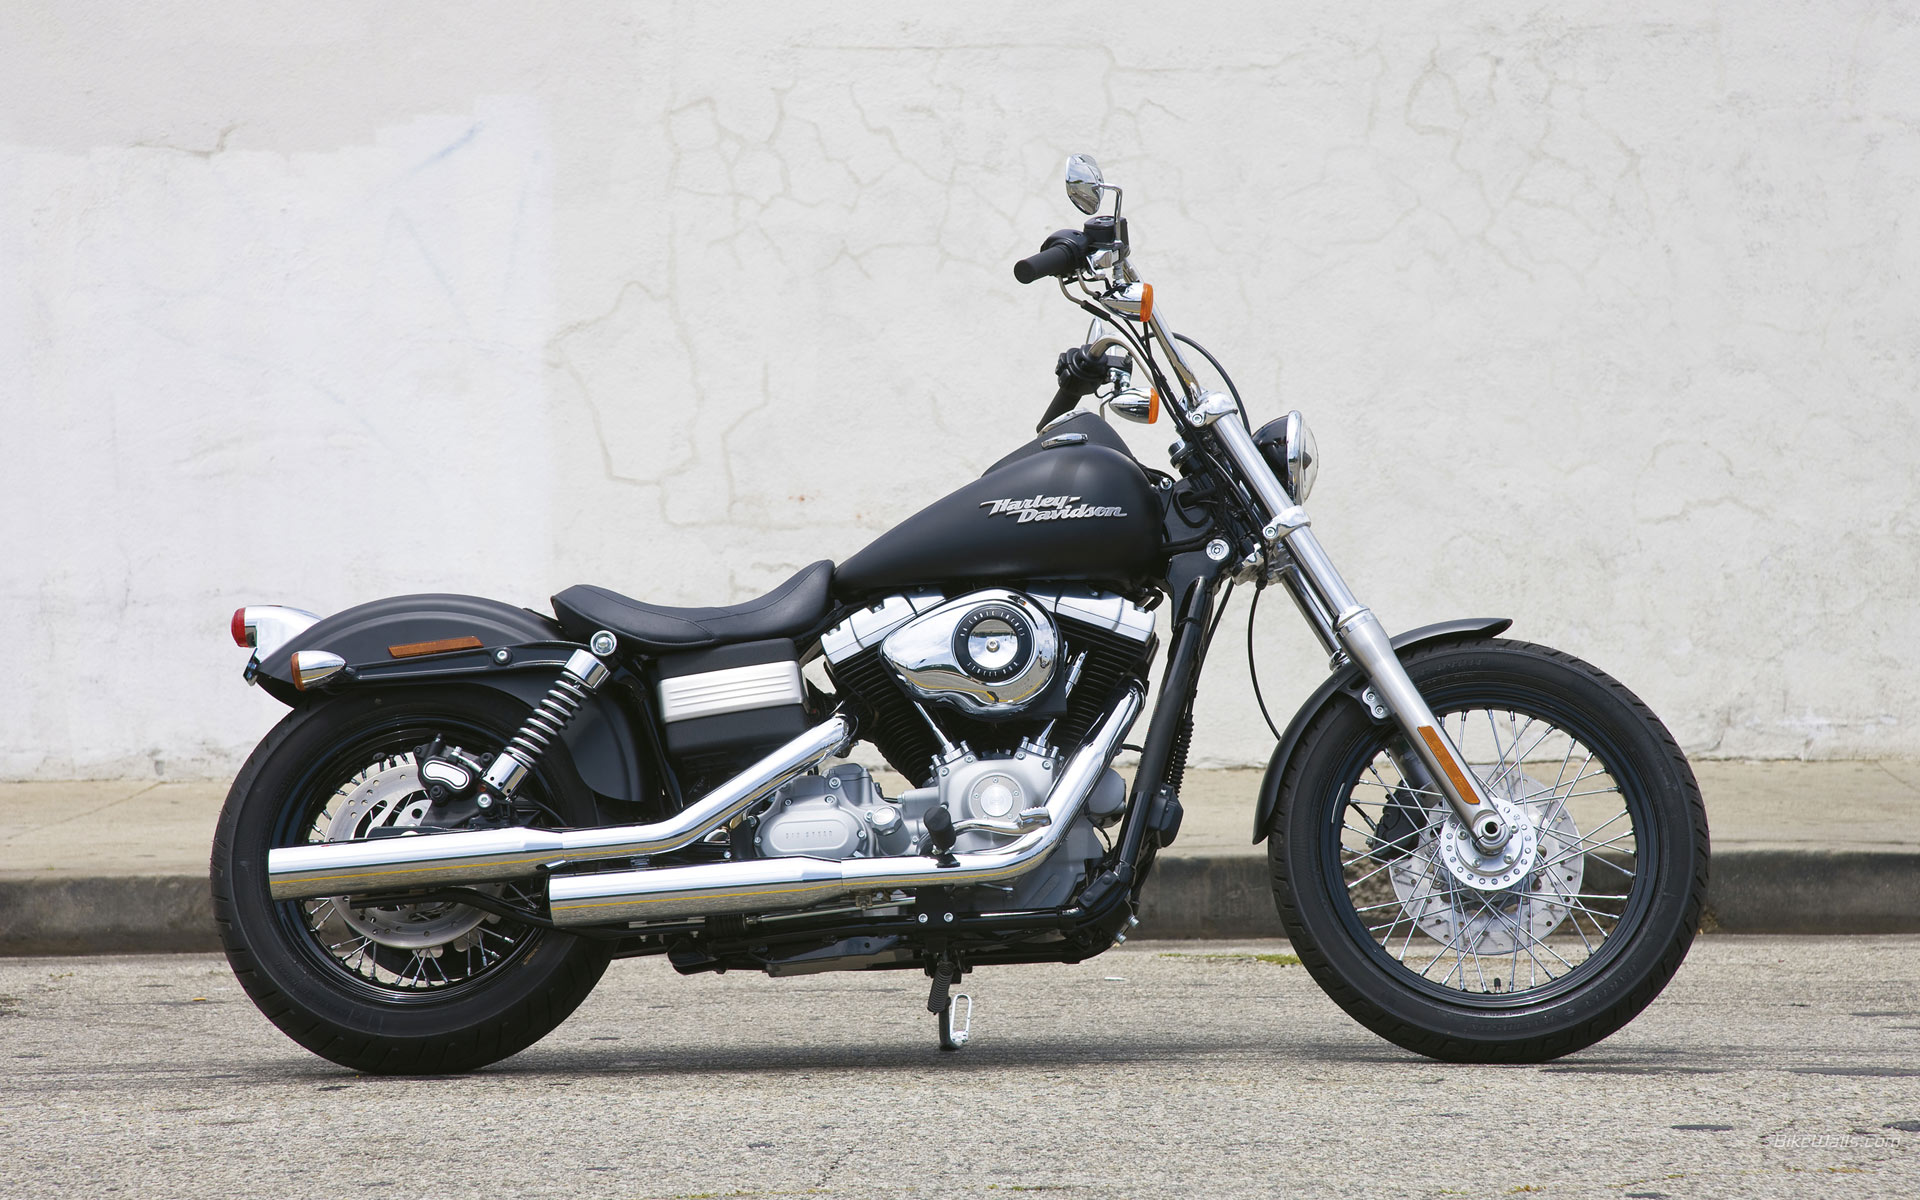 Harley Davidson Street Bob Wallpaper